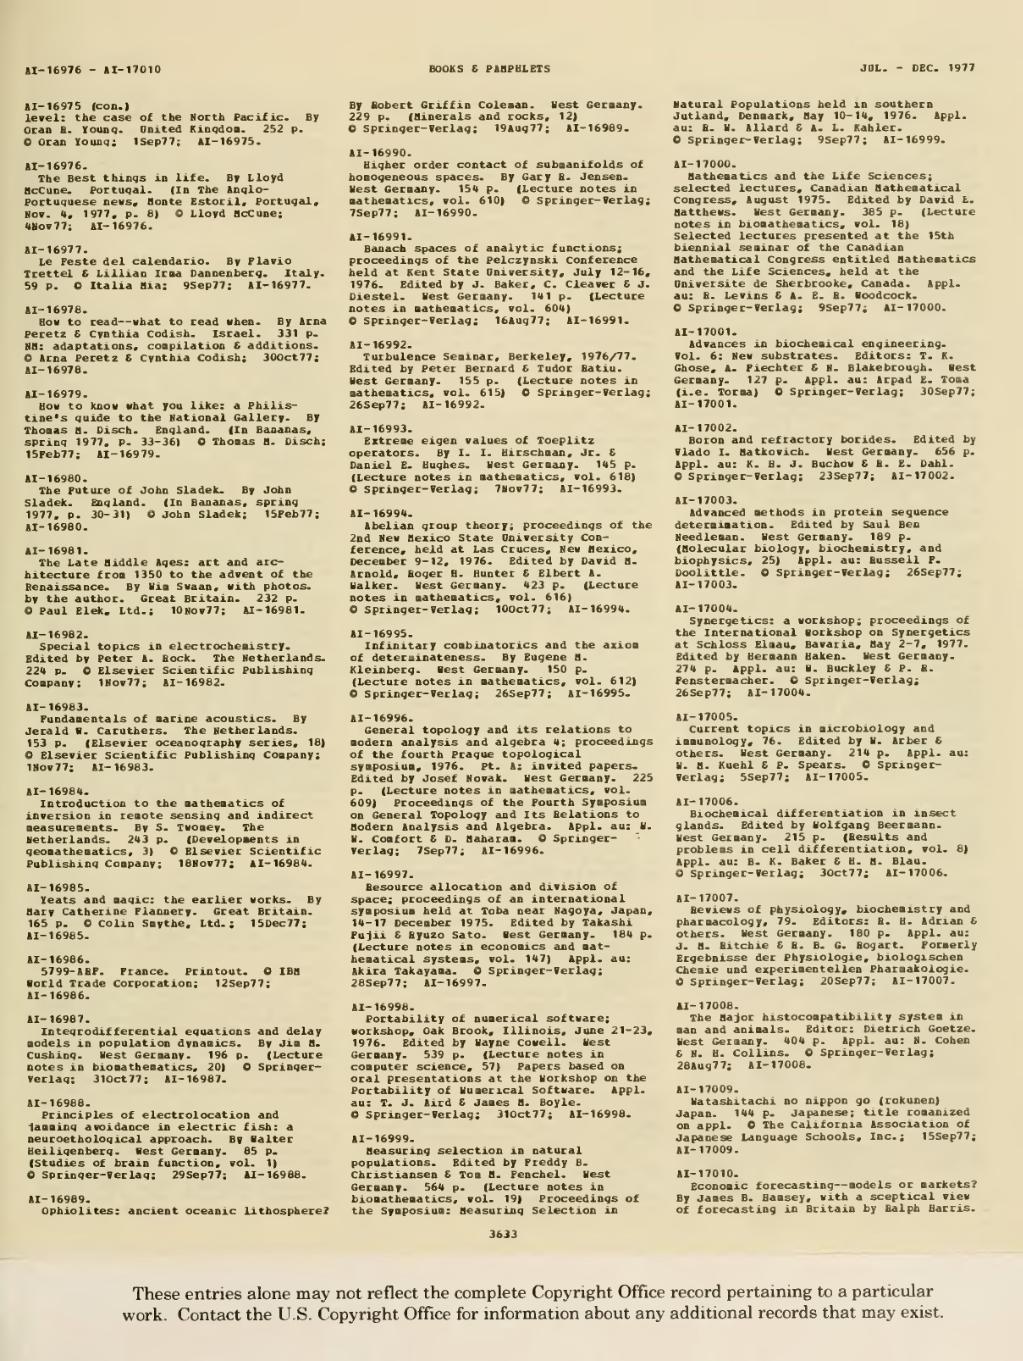 Calendario Del 1977.Page 1977 Books And Pamphlets July Dec Djvu 1747